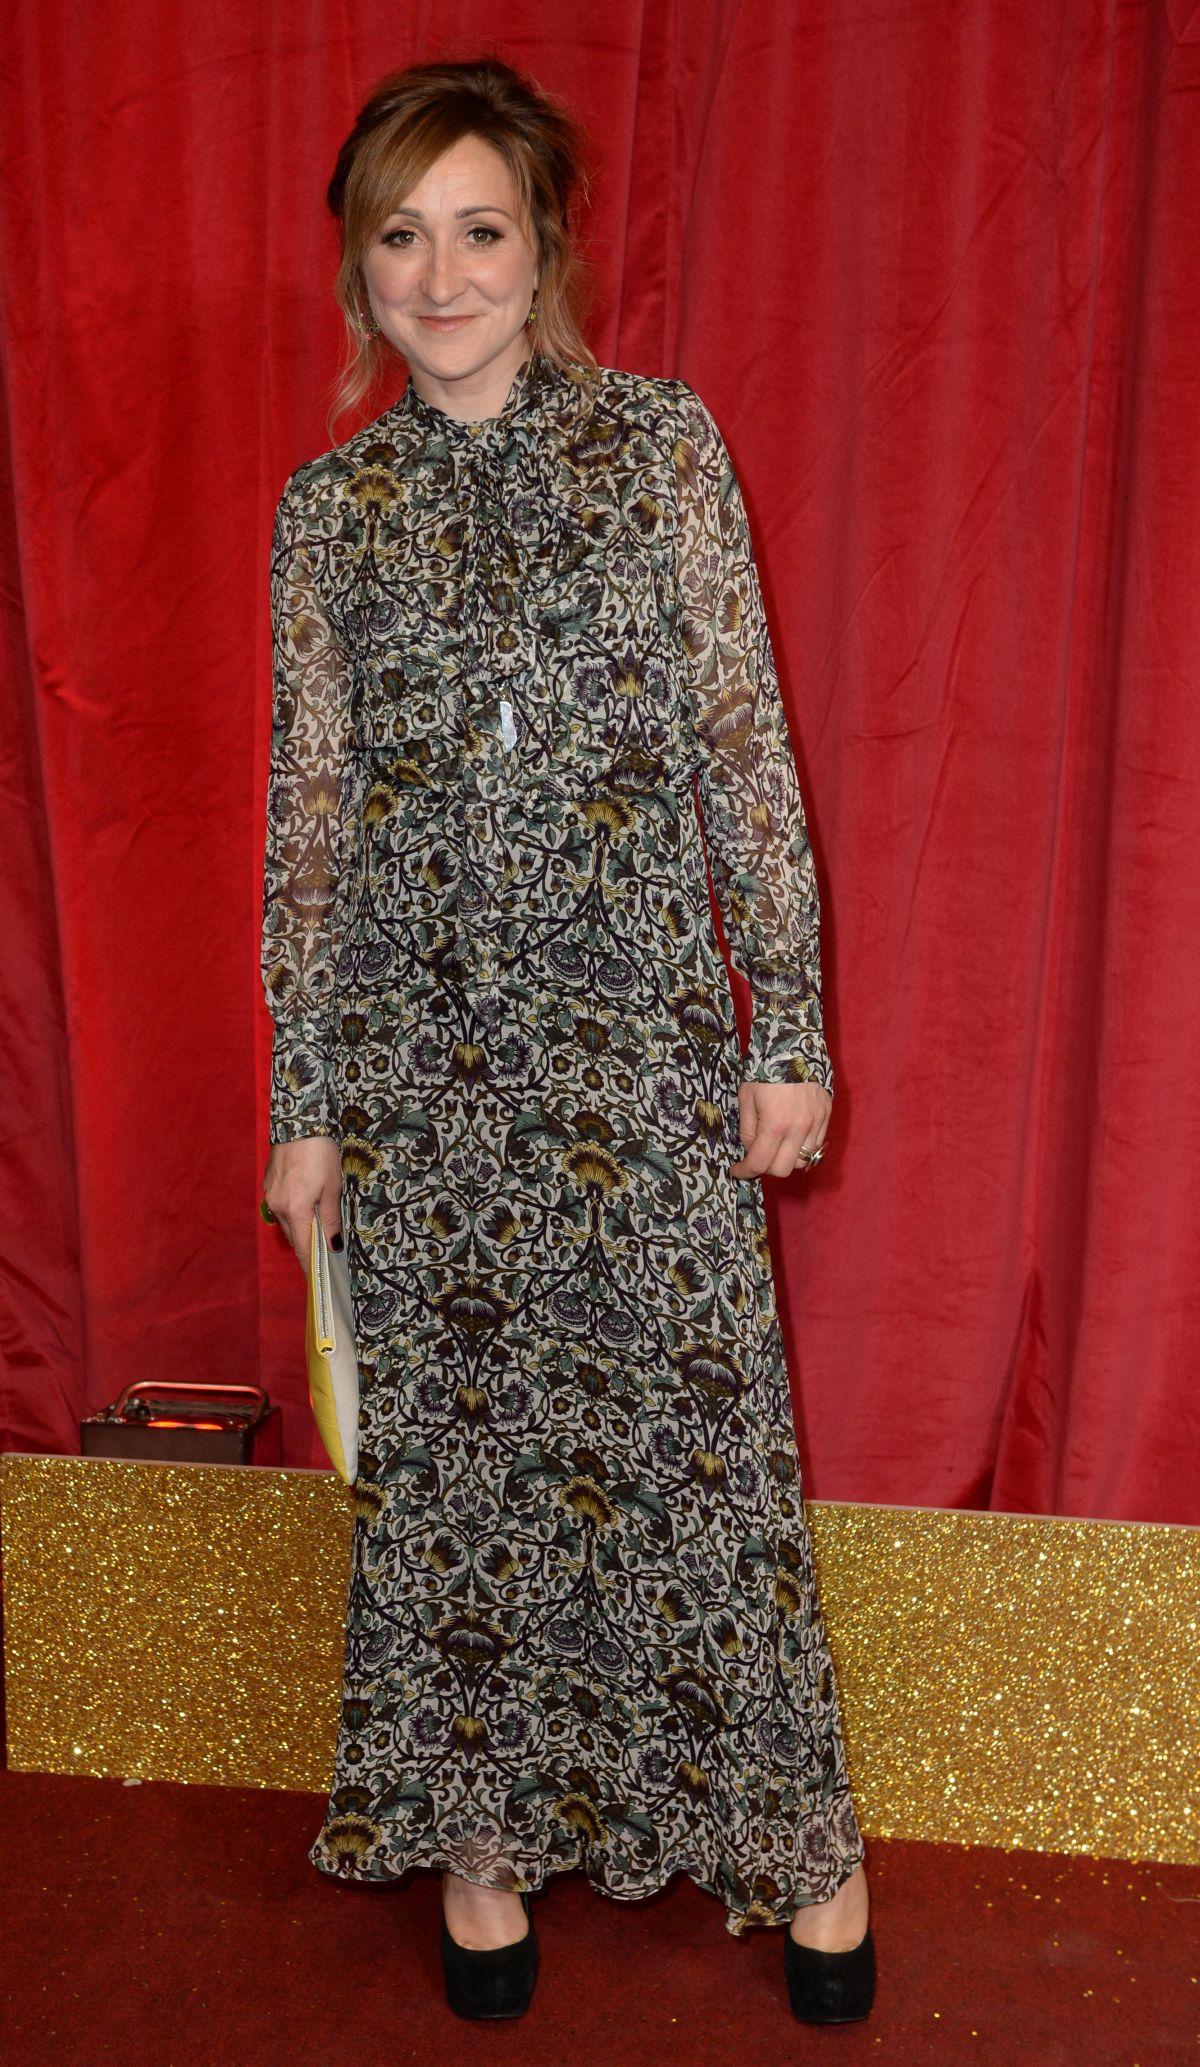 CHARLOTTE BELLAMY at British Soap Awards 2016 in London 05/28/2016